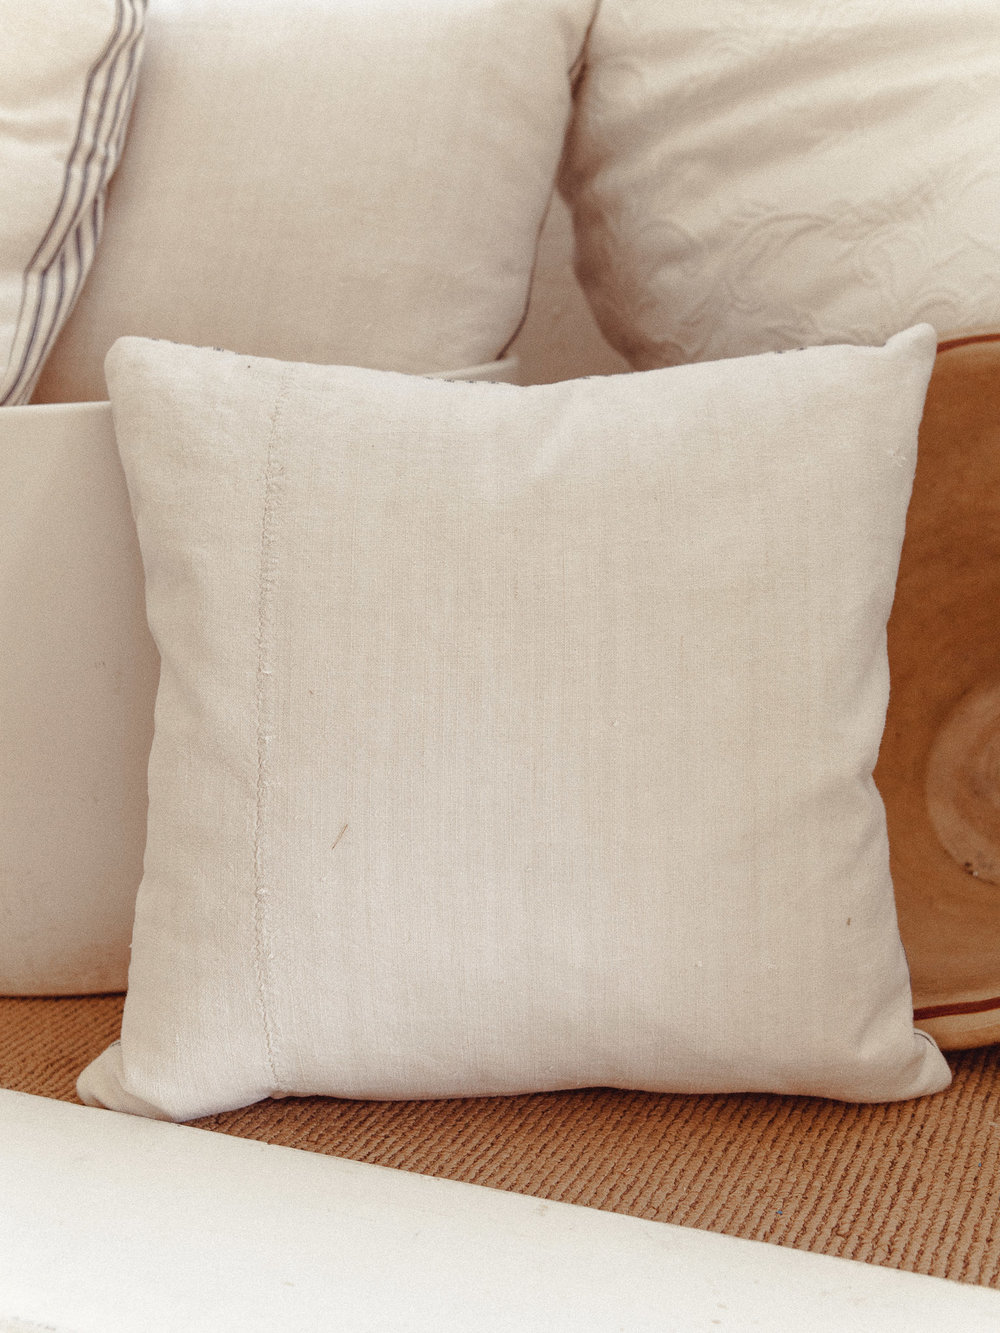 French Homespun Linen Pillows $125 -